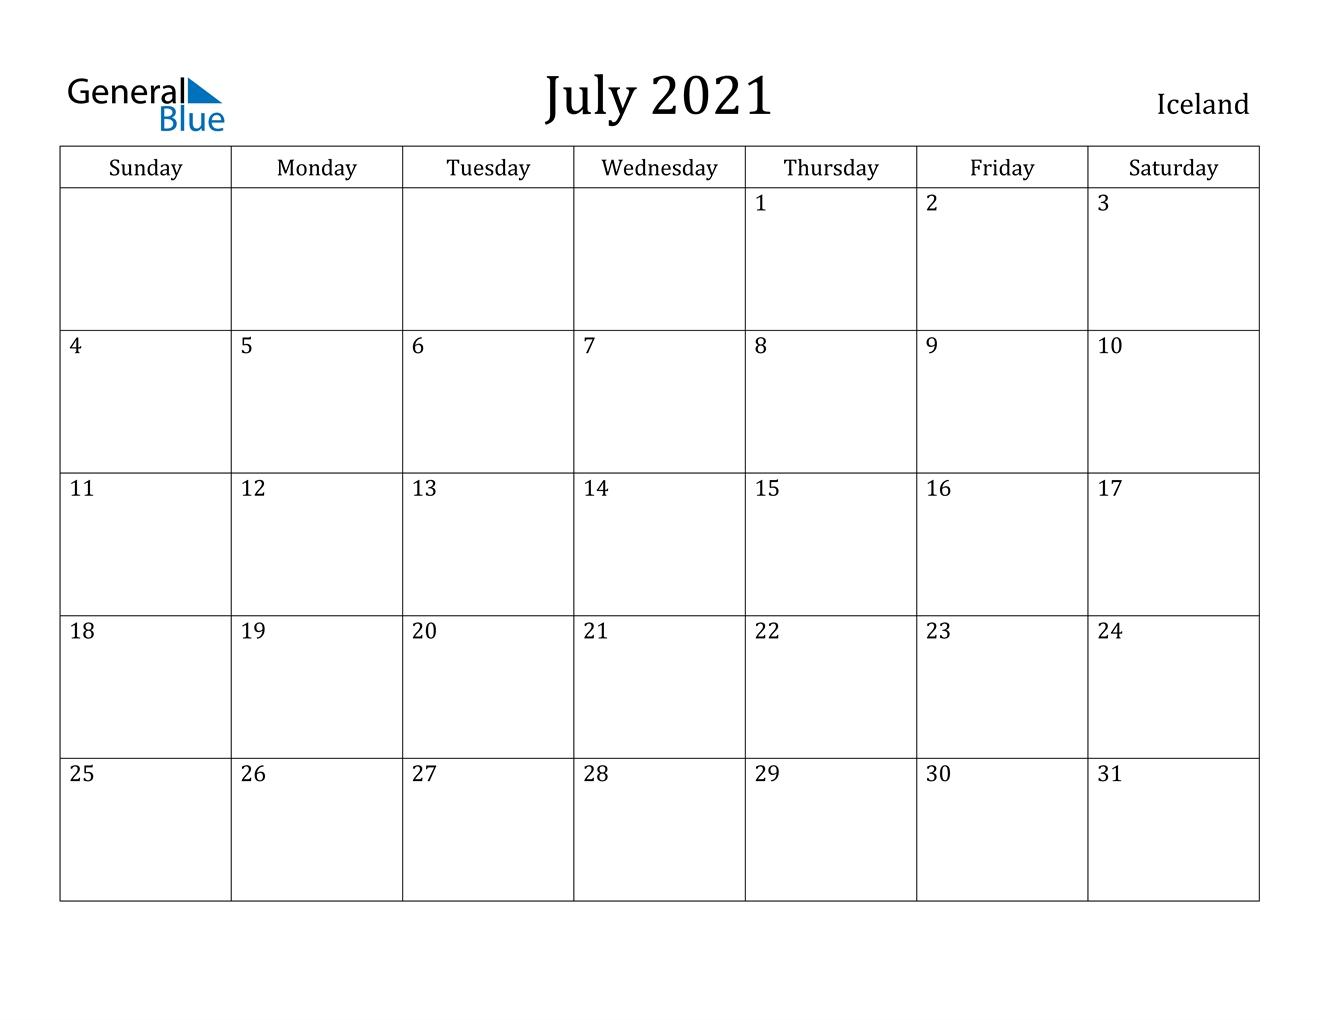 July 2021 Calendar - Iceland